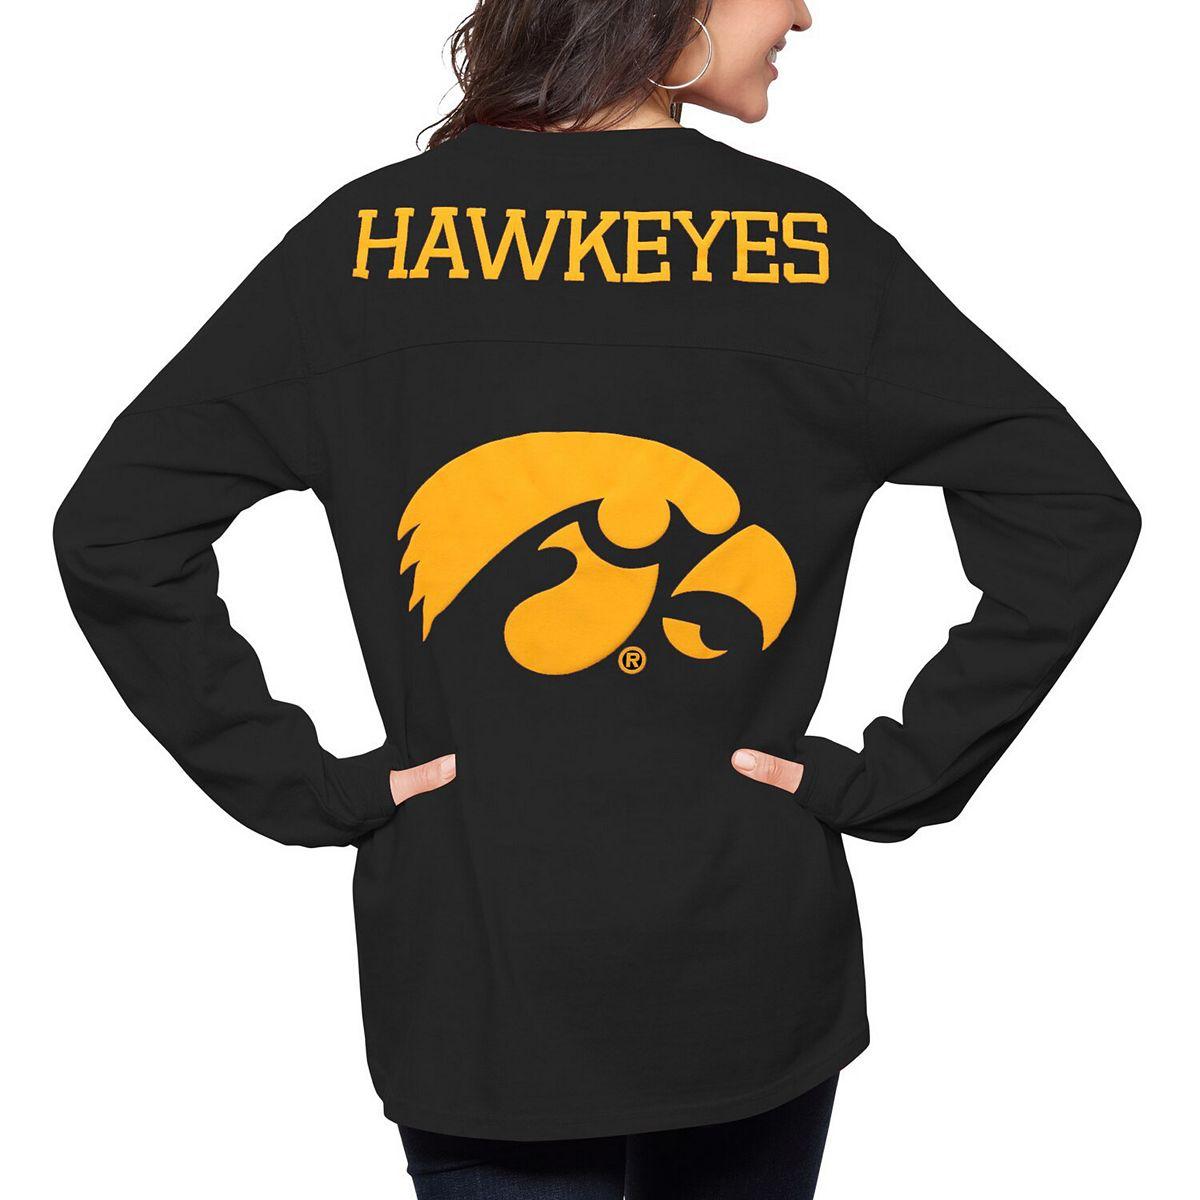 Women's Pressbox Black Iowa Hawkeyes The Big Shirt Oversized Long Sleeve T-Shirt GUuLc